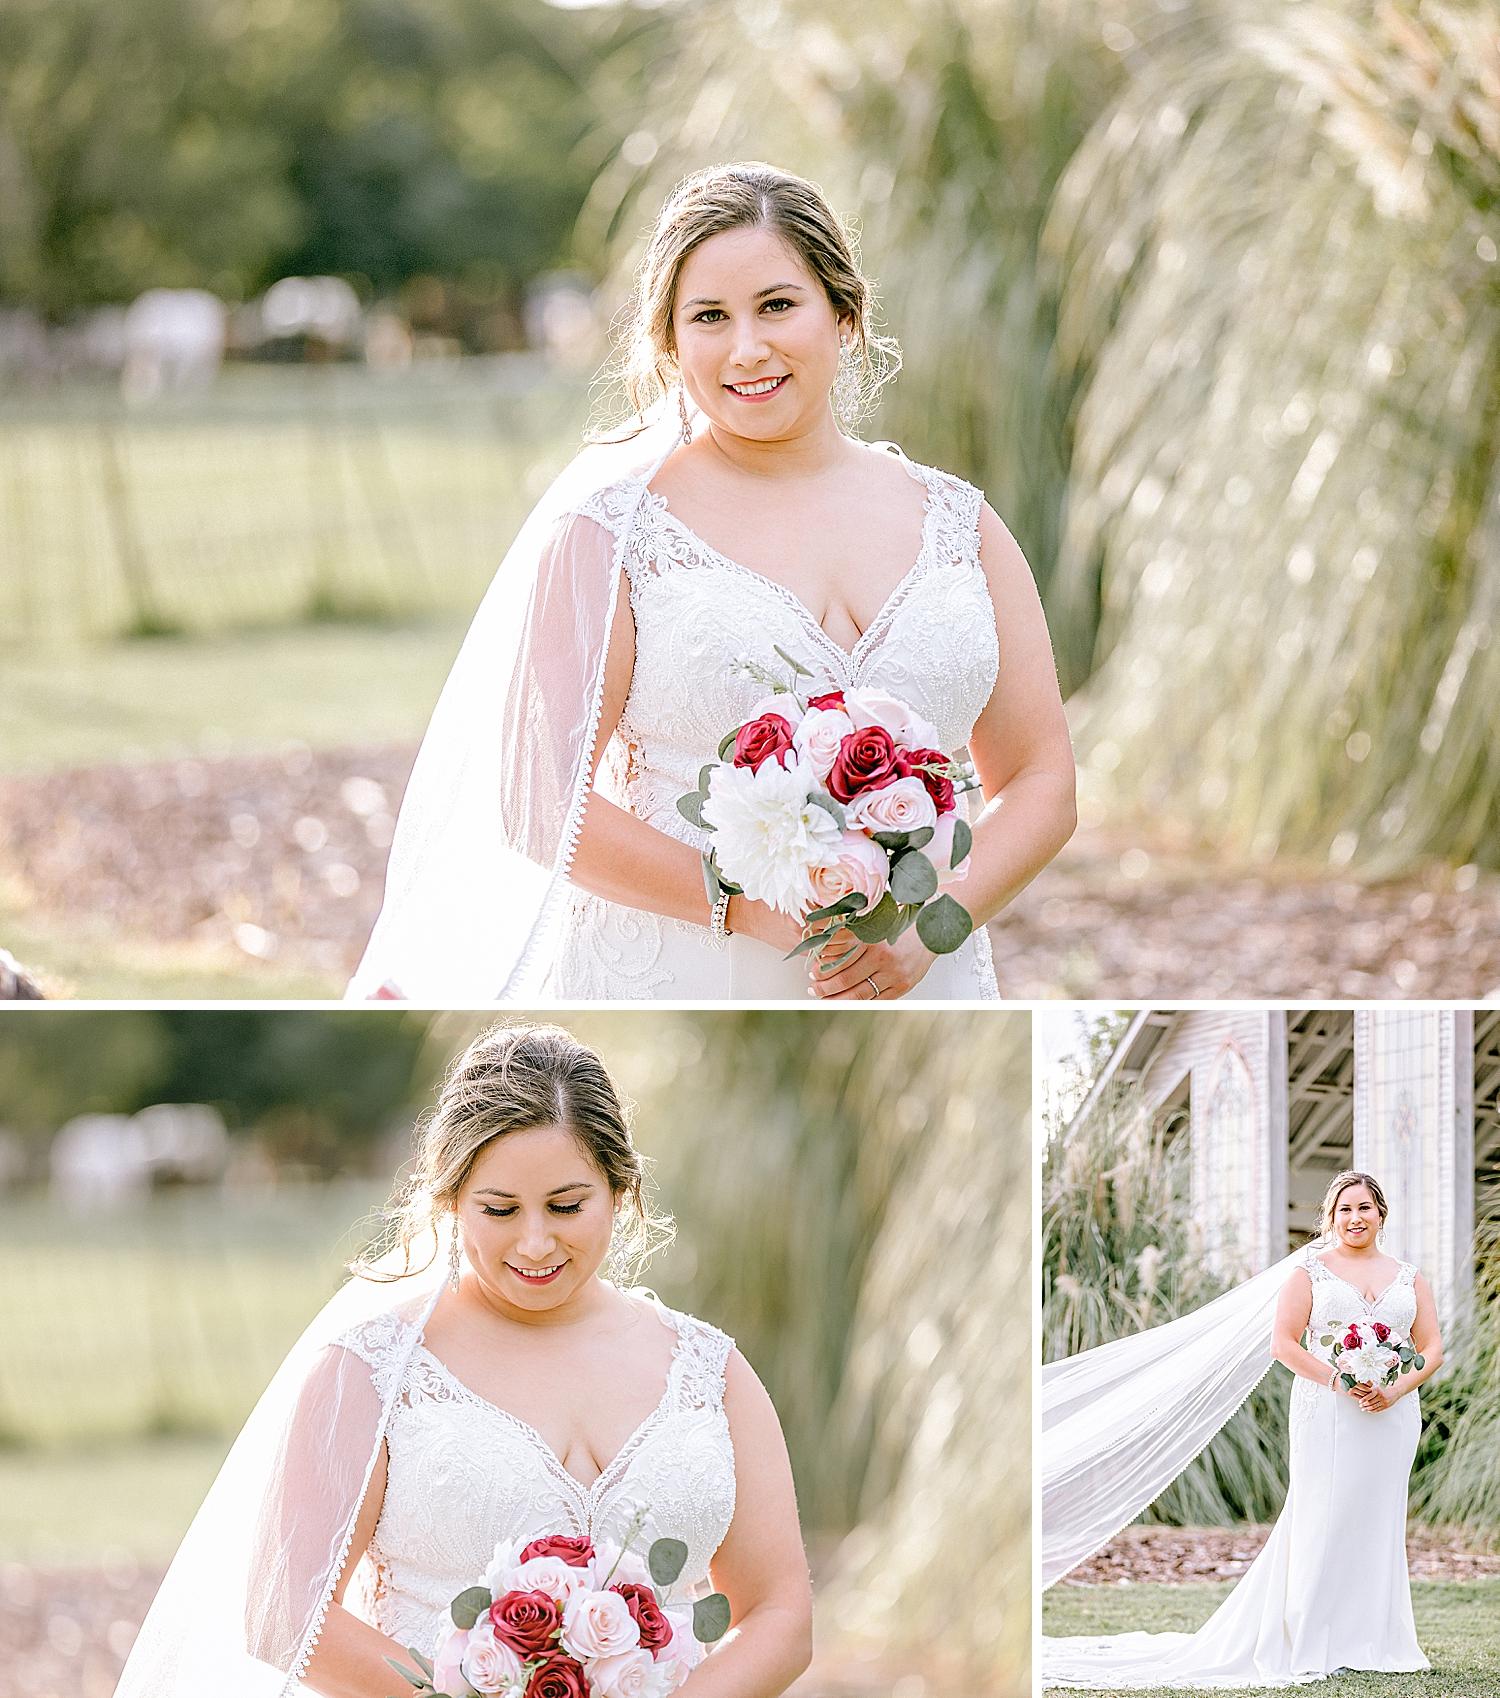 Carly-Barton-Photography-Gruene-Estate-Wedding-Photographer-New-Braunfels-Texas-Bridal-Session_0014.jpg